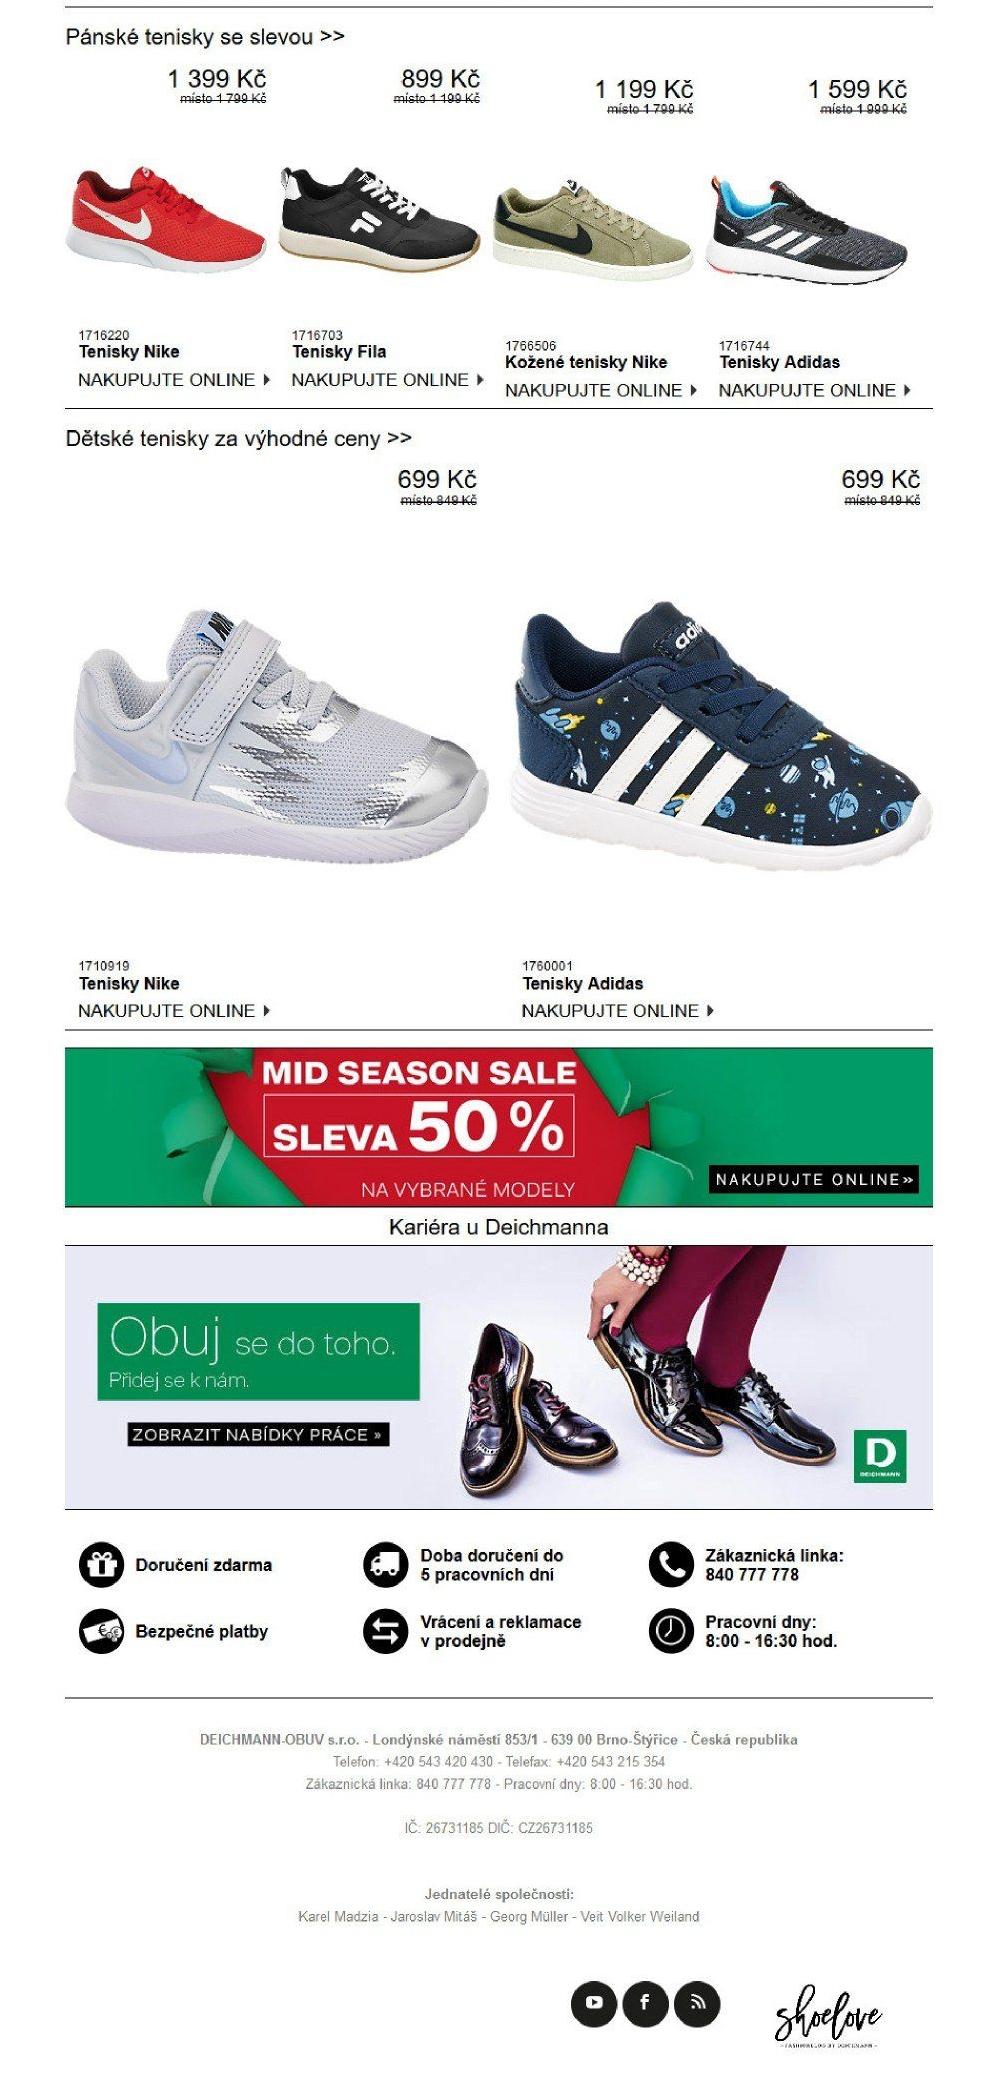 533bedb856 Pánské tenisky Adidas v akci DEICHMANN od 25.10.2018